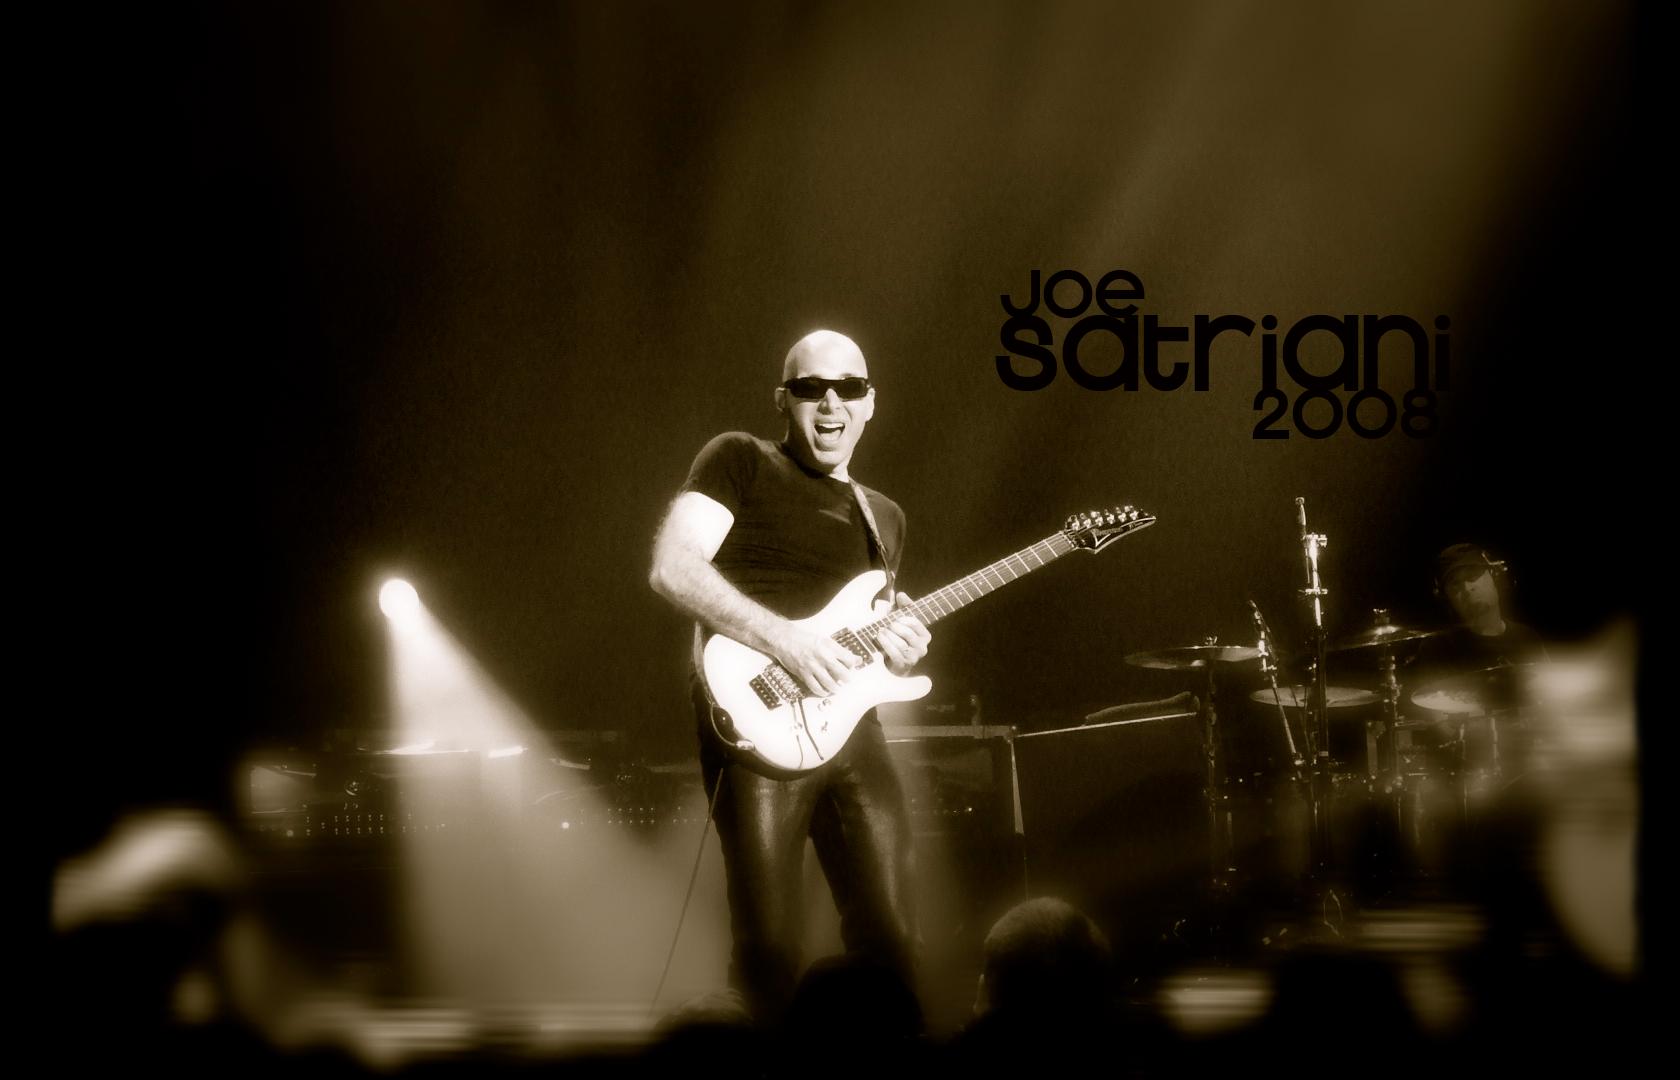 Joe Satriani Computer Wallpapers Desktop Backgrounds 1680x1080